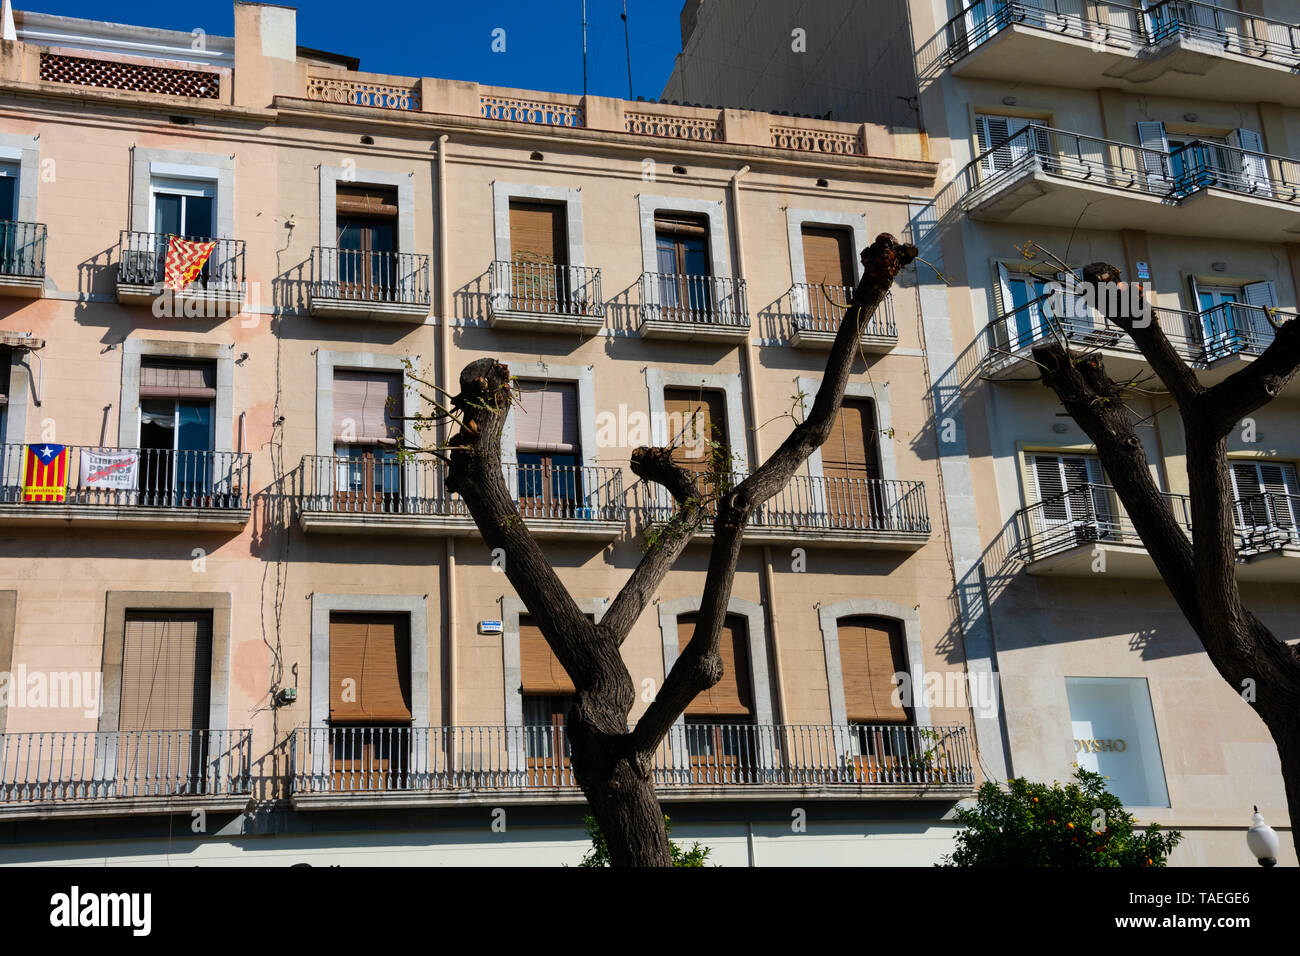 Tarragona, Spain. February 8, 2019. Old building facade in Rambla Nova, a main city walk with restaurants and shops - Stock Image